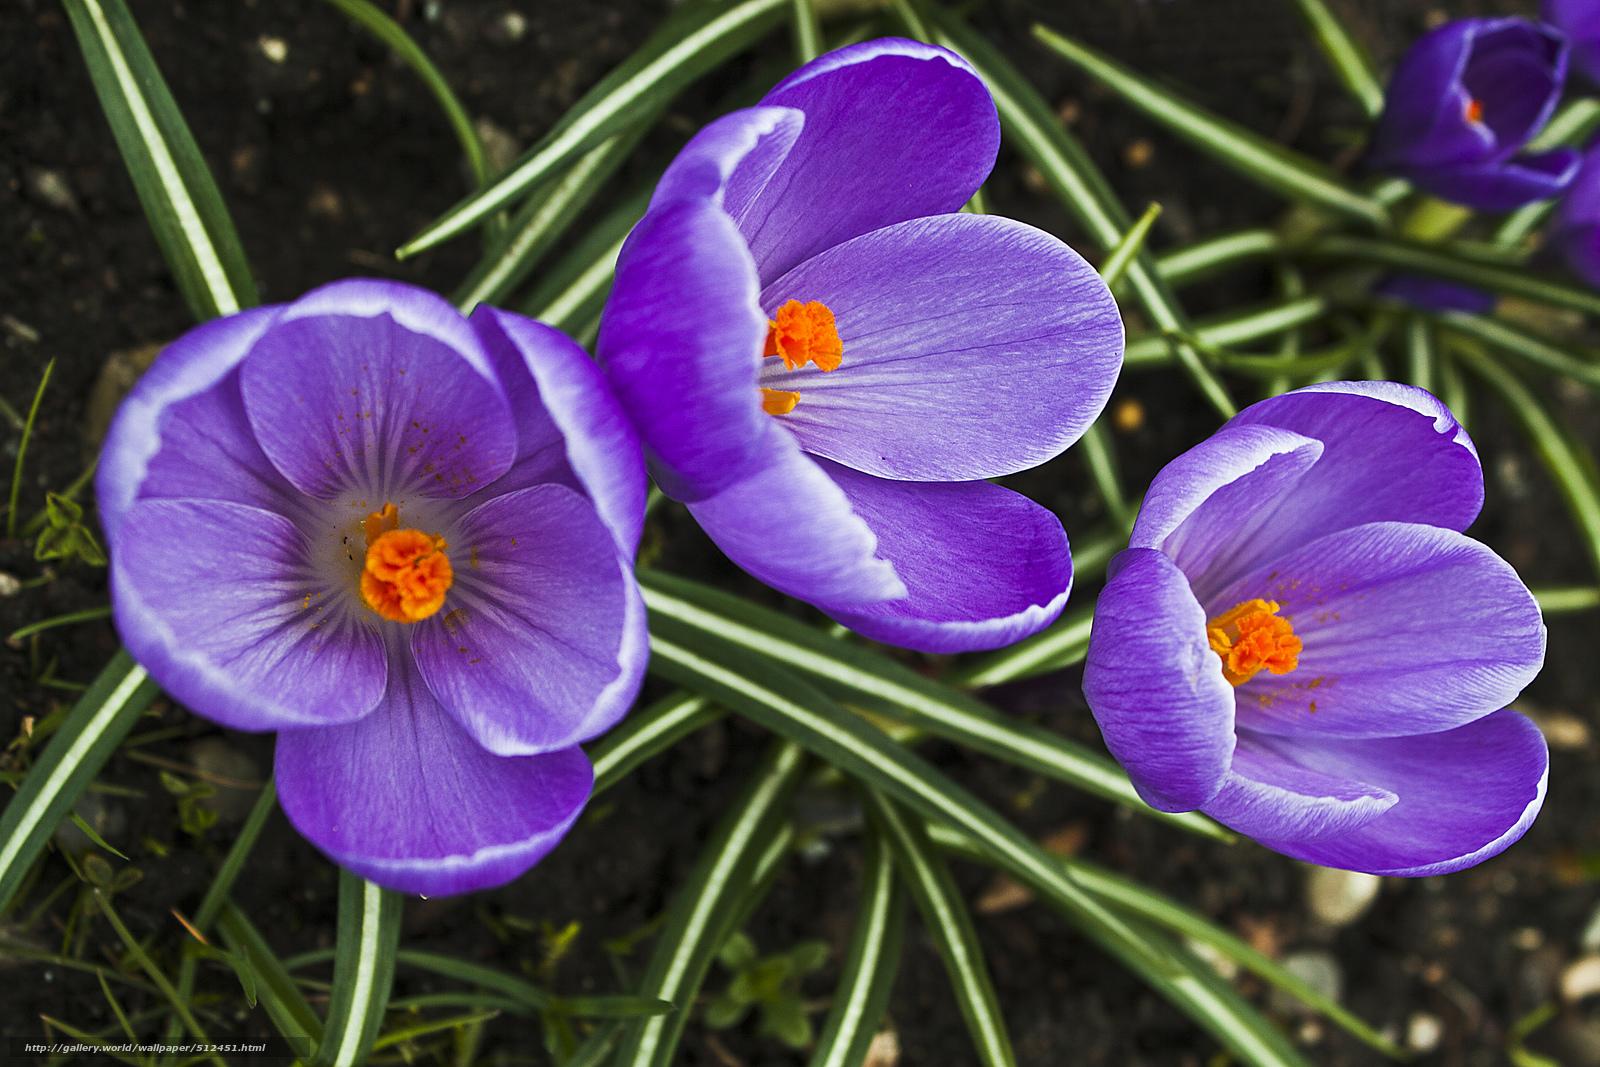 цветы крокусы фото: